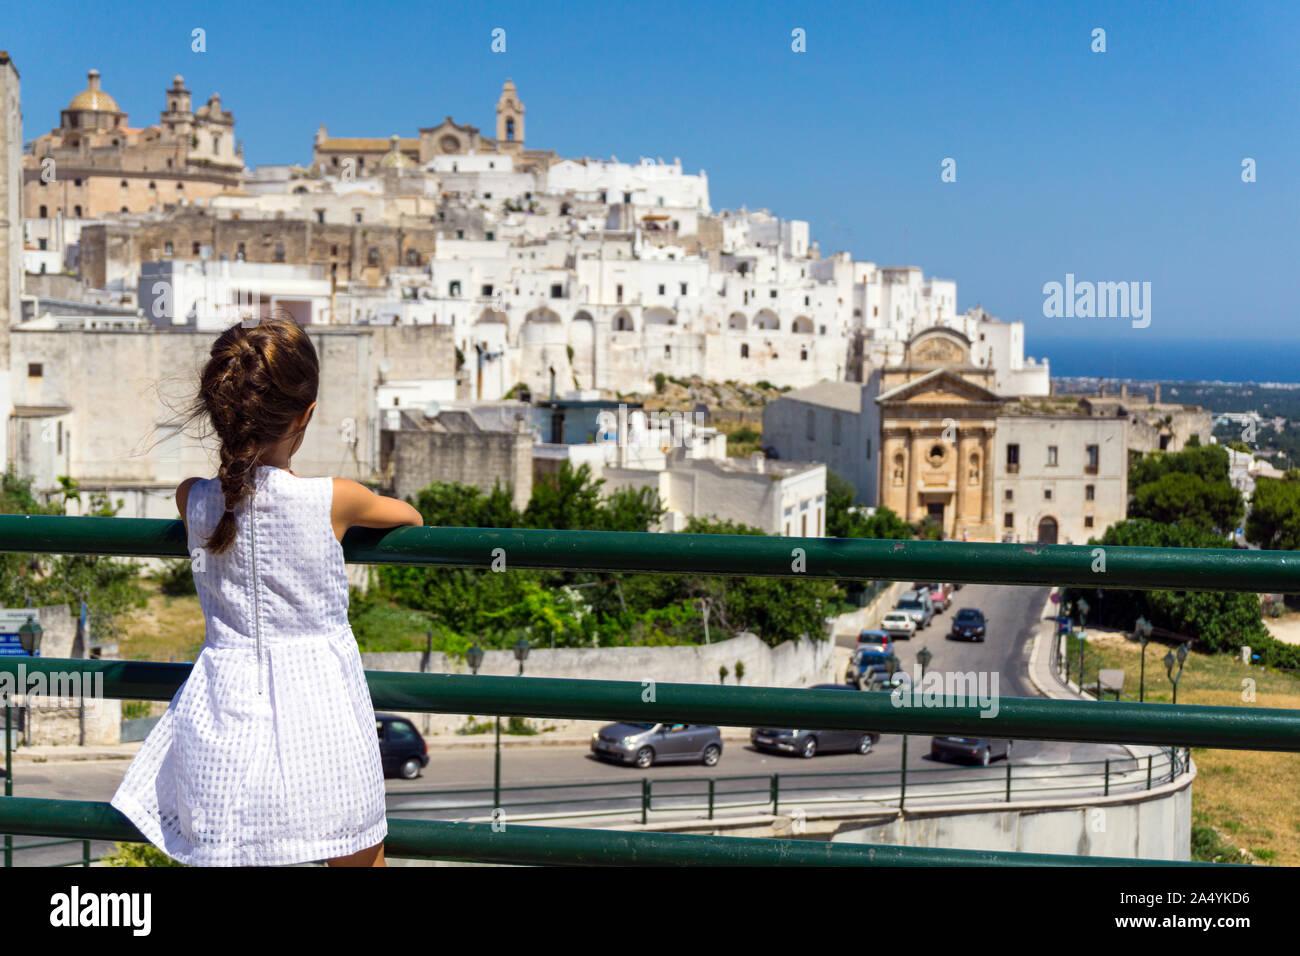 Italy, Apulia, Ostuni, little girl looking old town cityscape Stock Photo